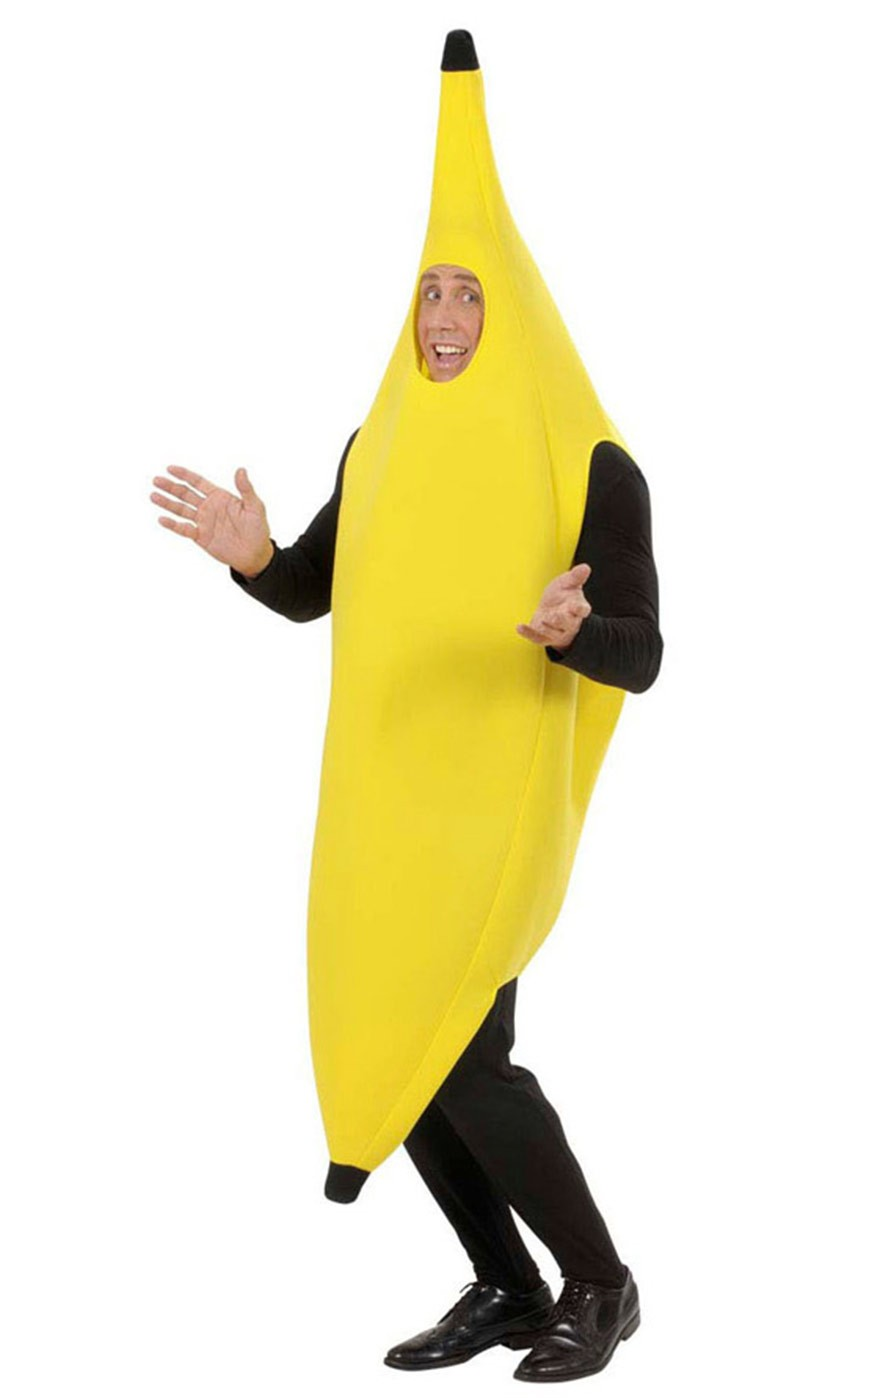 Adult Unisex Onesize Funny Banana Suit Yellow Costume Fancy Dress